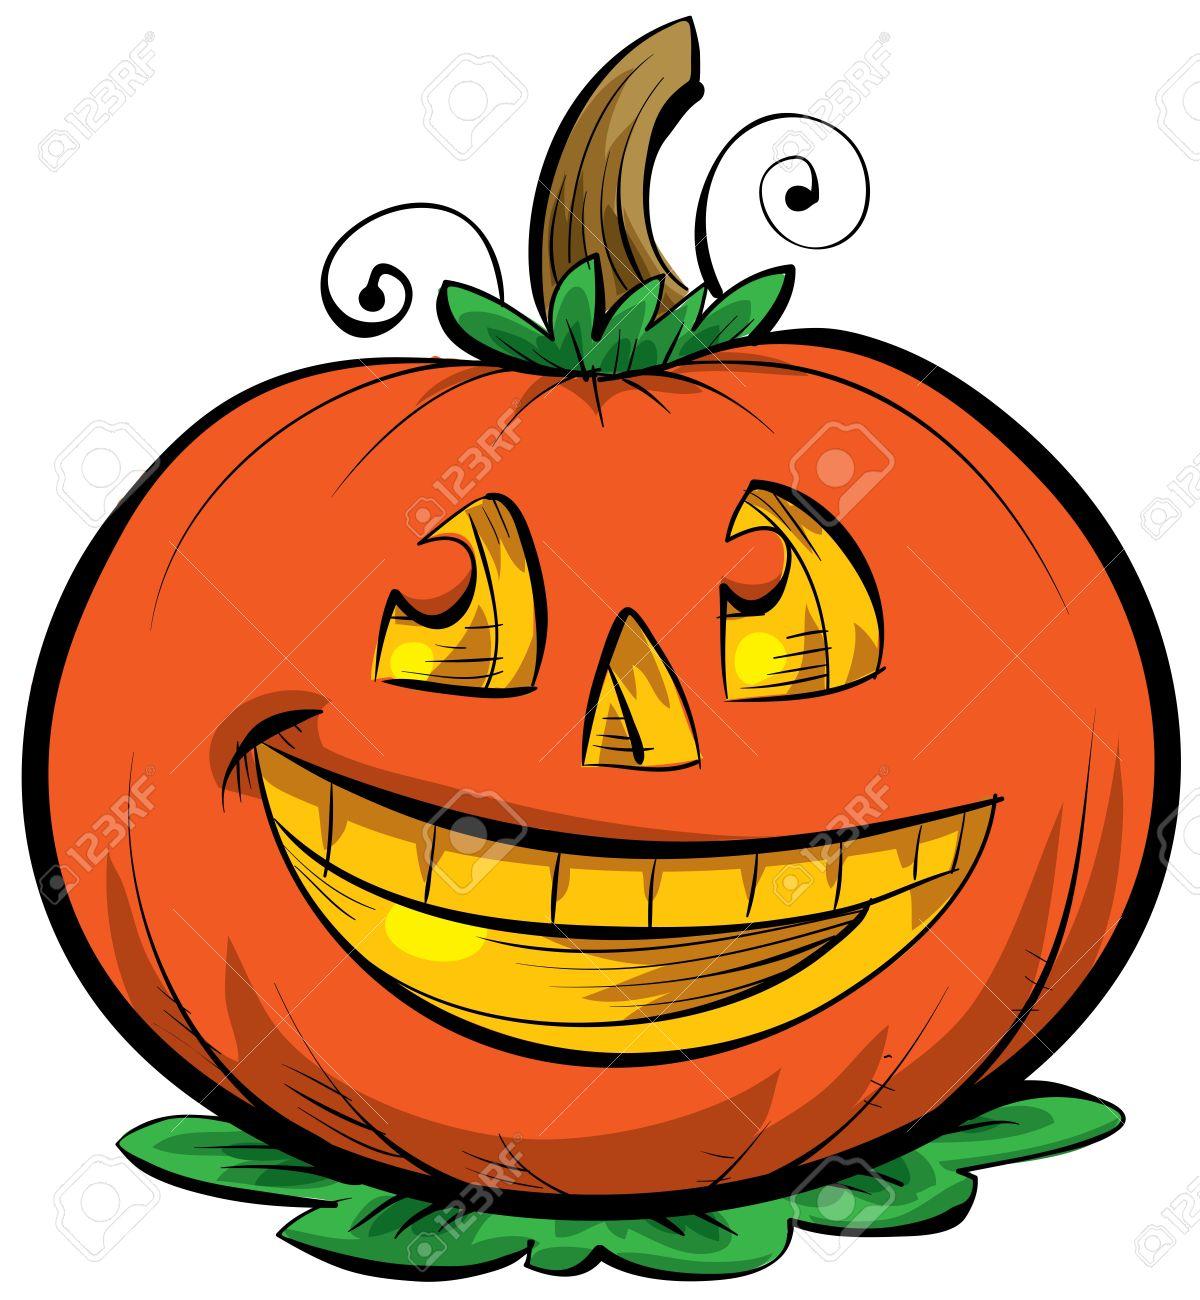 1200x1300 A Smiling, Cartoon Jack O' Lantern Stock Photo, Picture